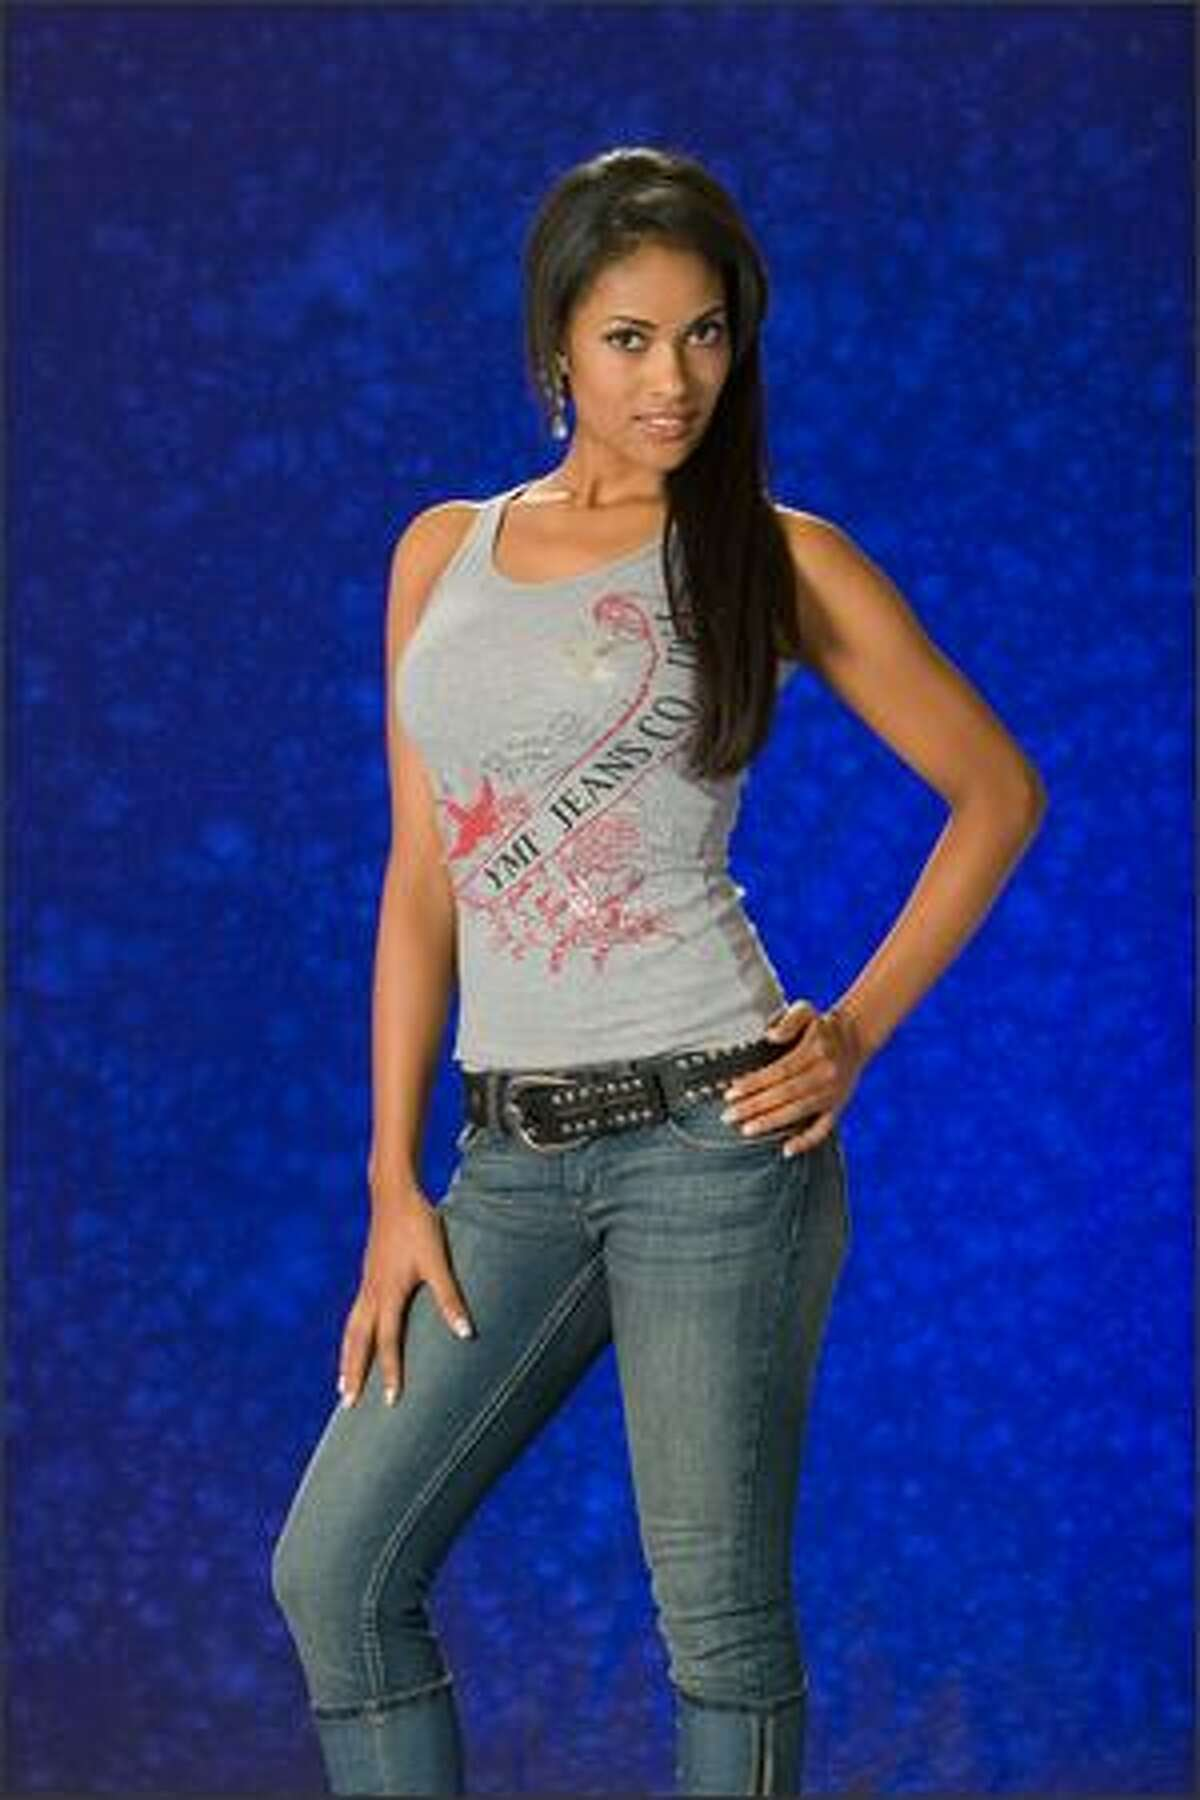 Micaela Reis, Miss Angola 2007.